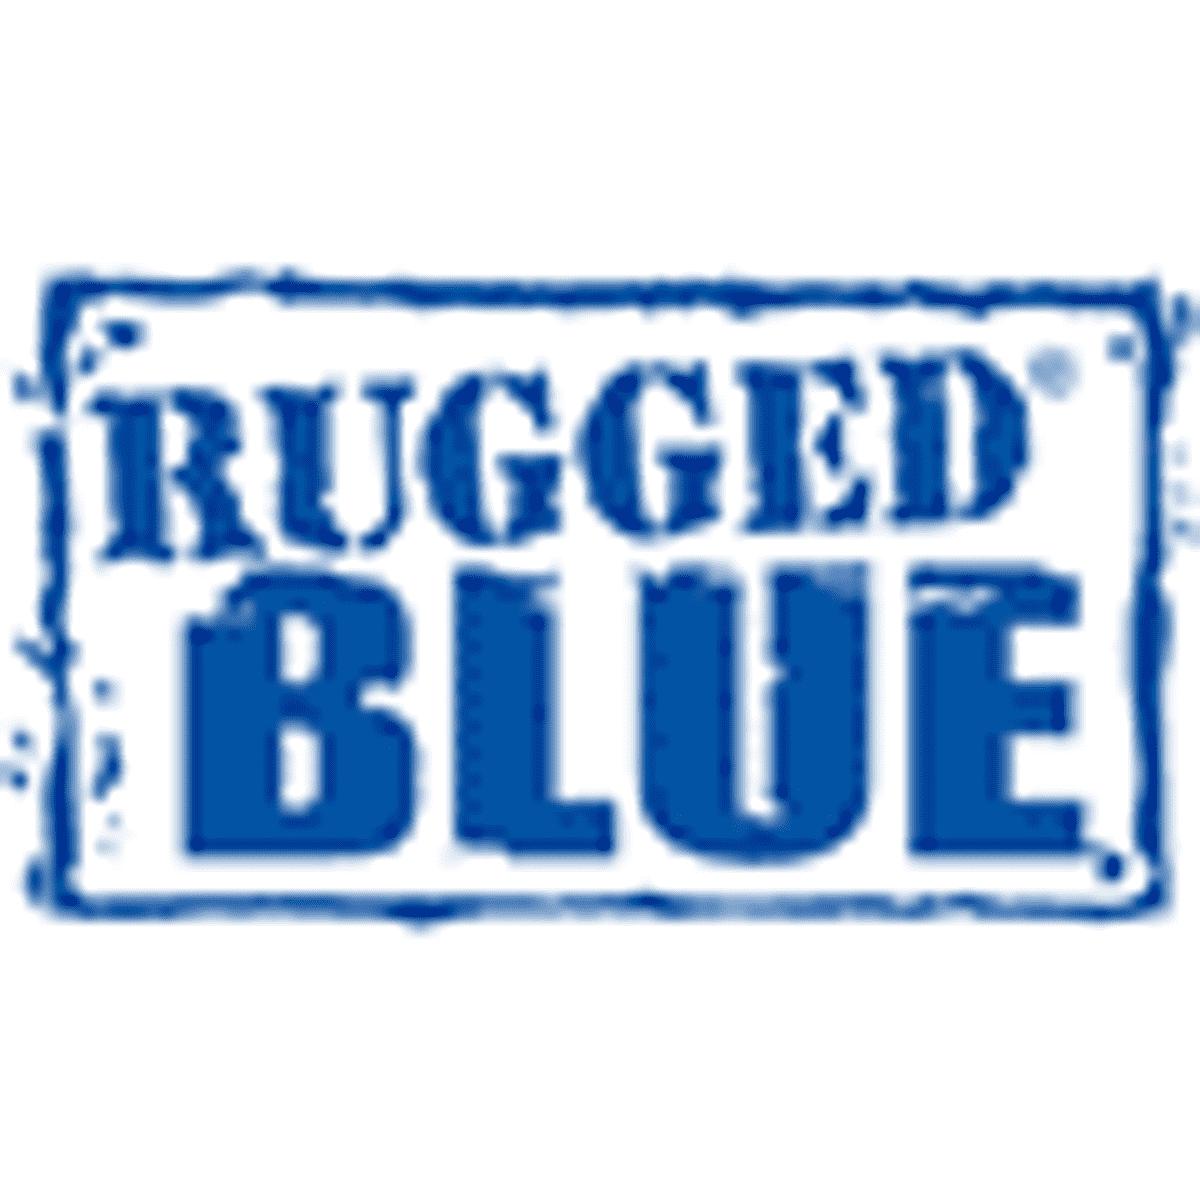 Rugged Blue Outerwear